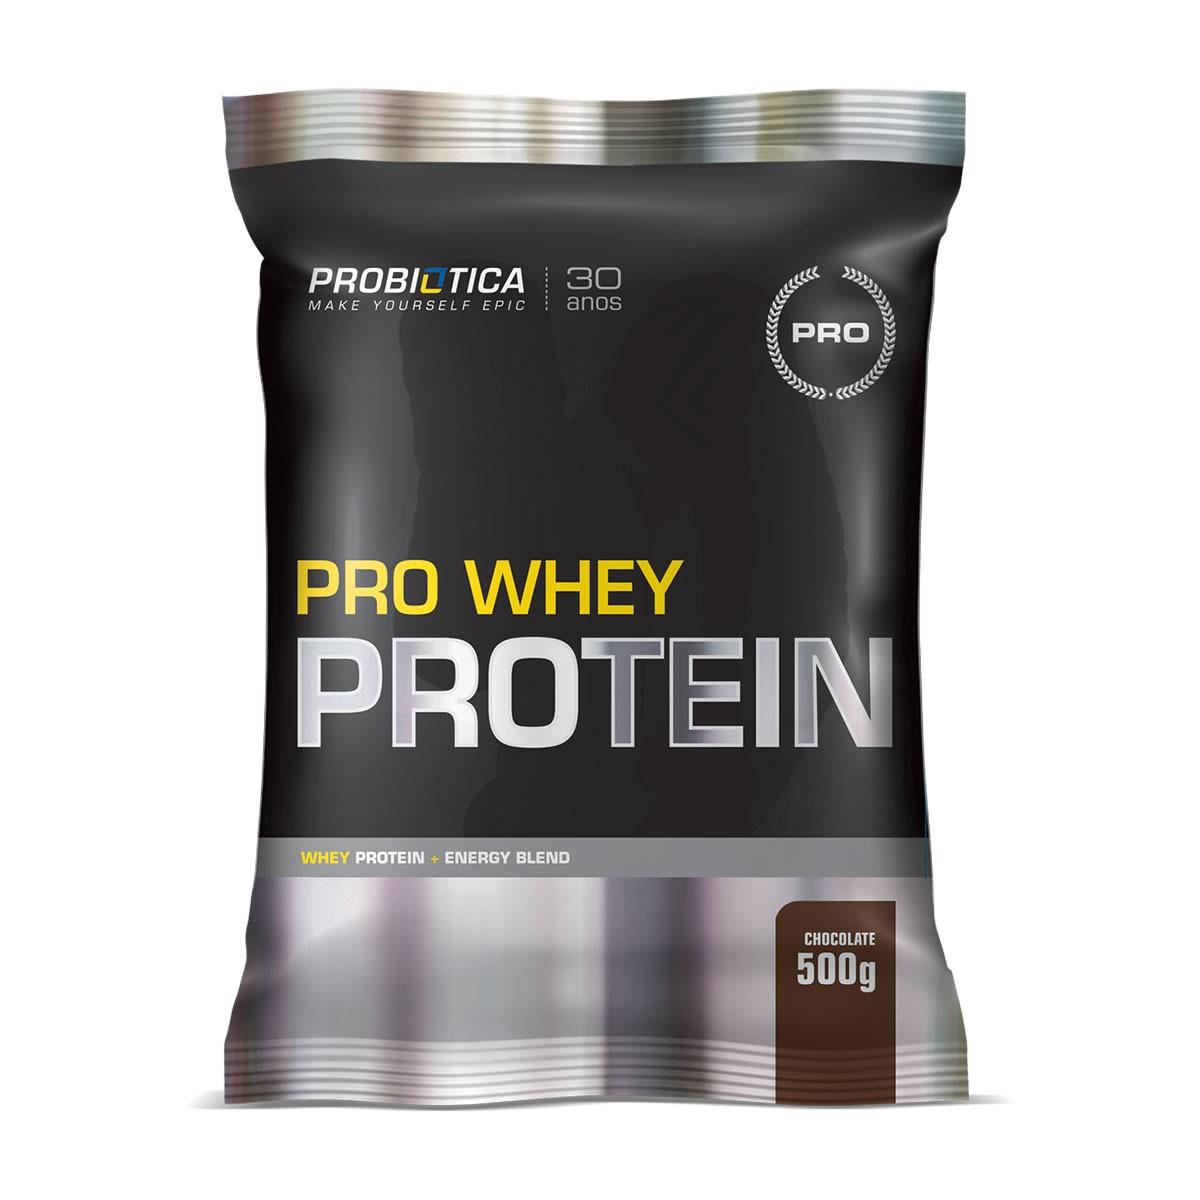 Pro Whey Protein Sabor Chocolate 500g - Probiotica